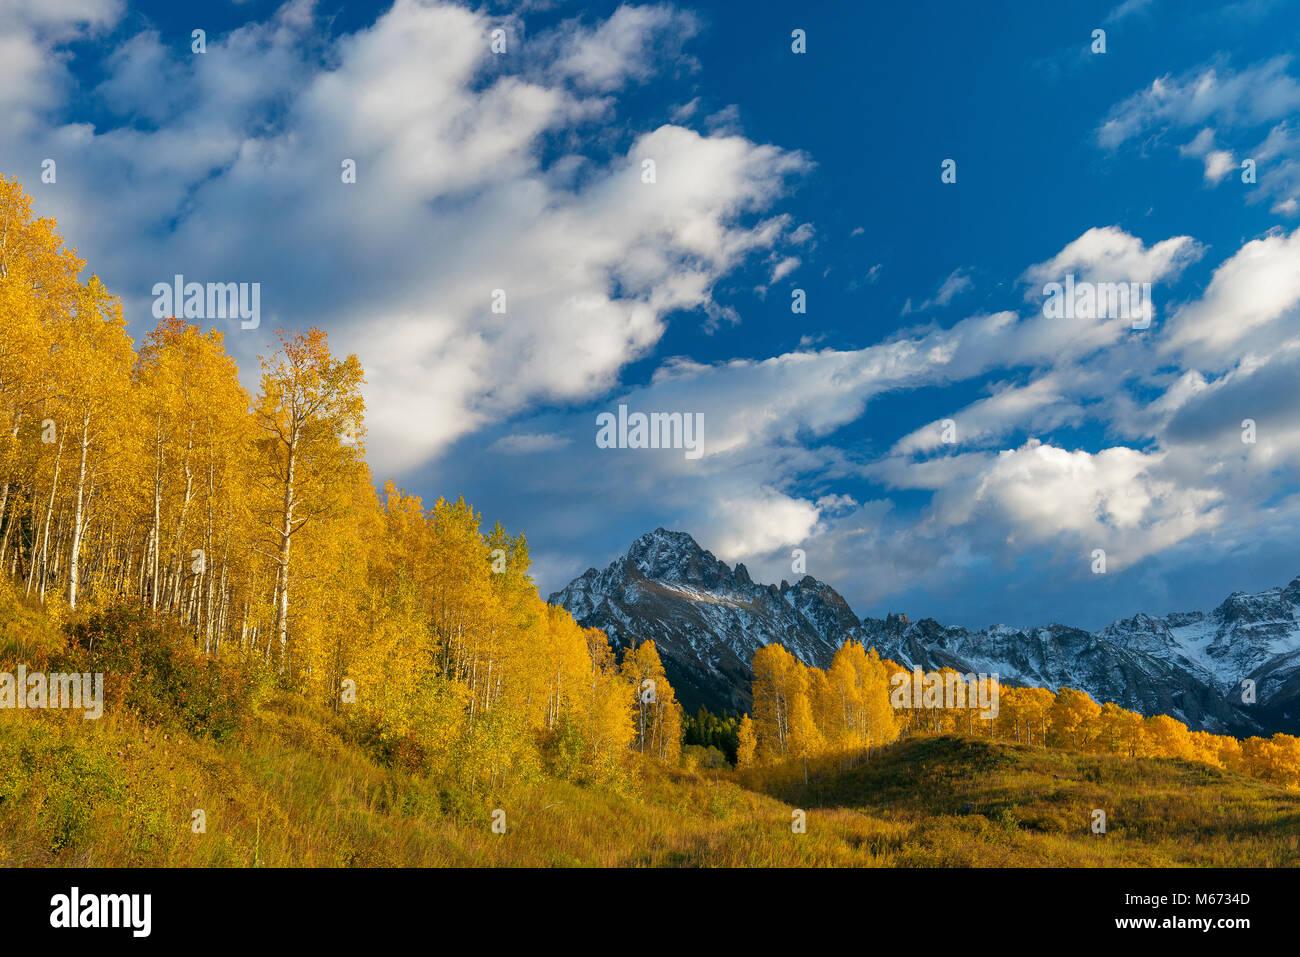 Sonnenuntergang, Aspen, Populus tremula, Mount Sneffels, Dallas Divide, Uncompahgre National Forest, Colorado Stockbild